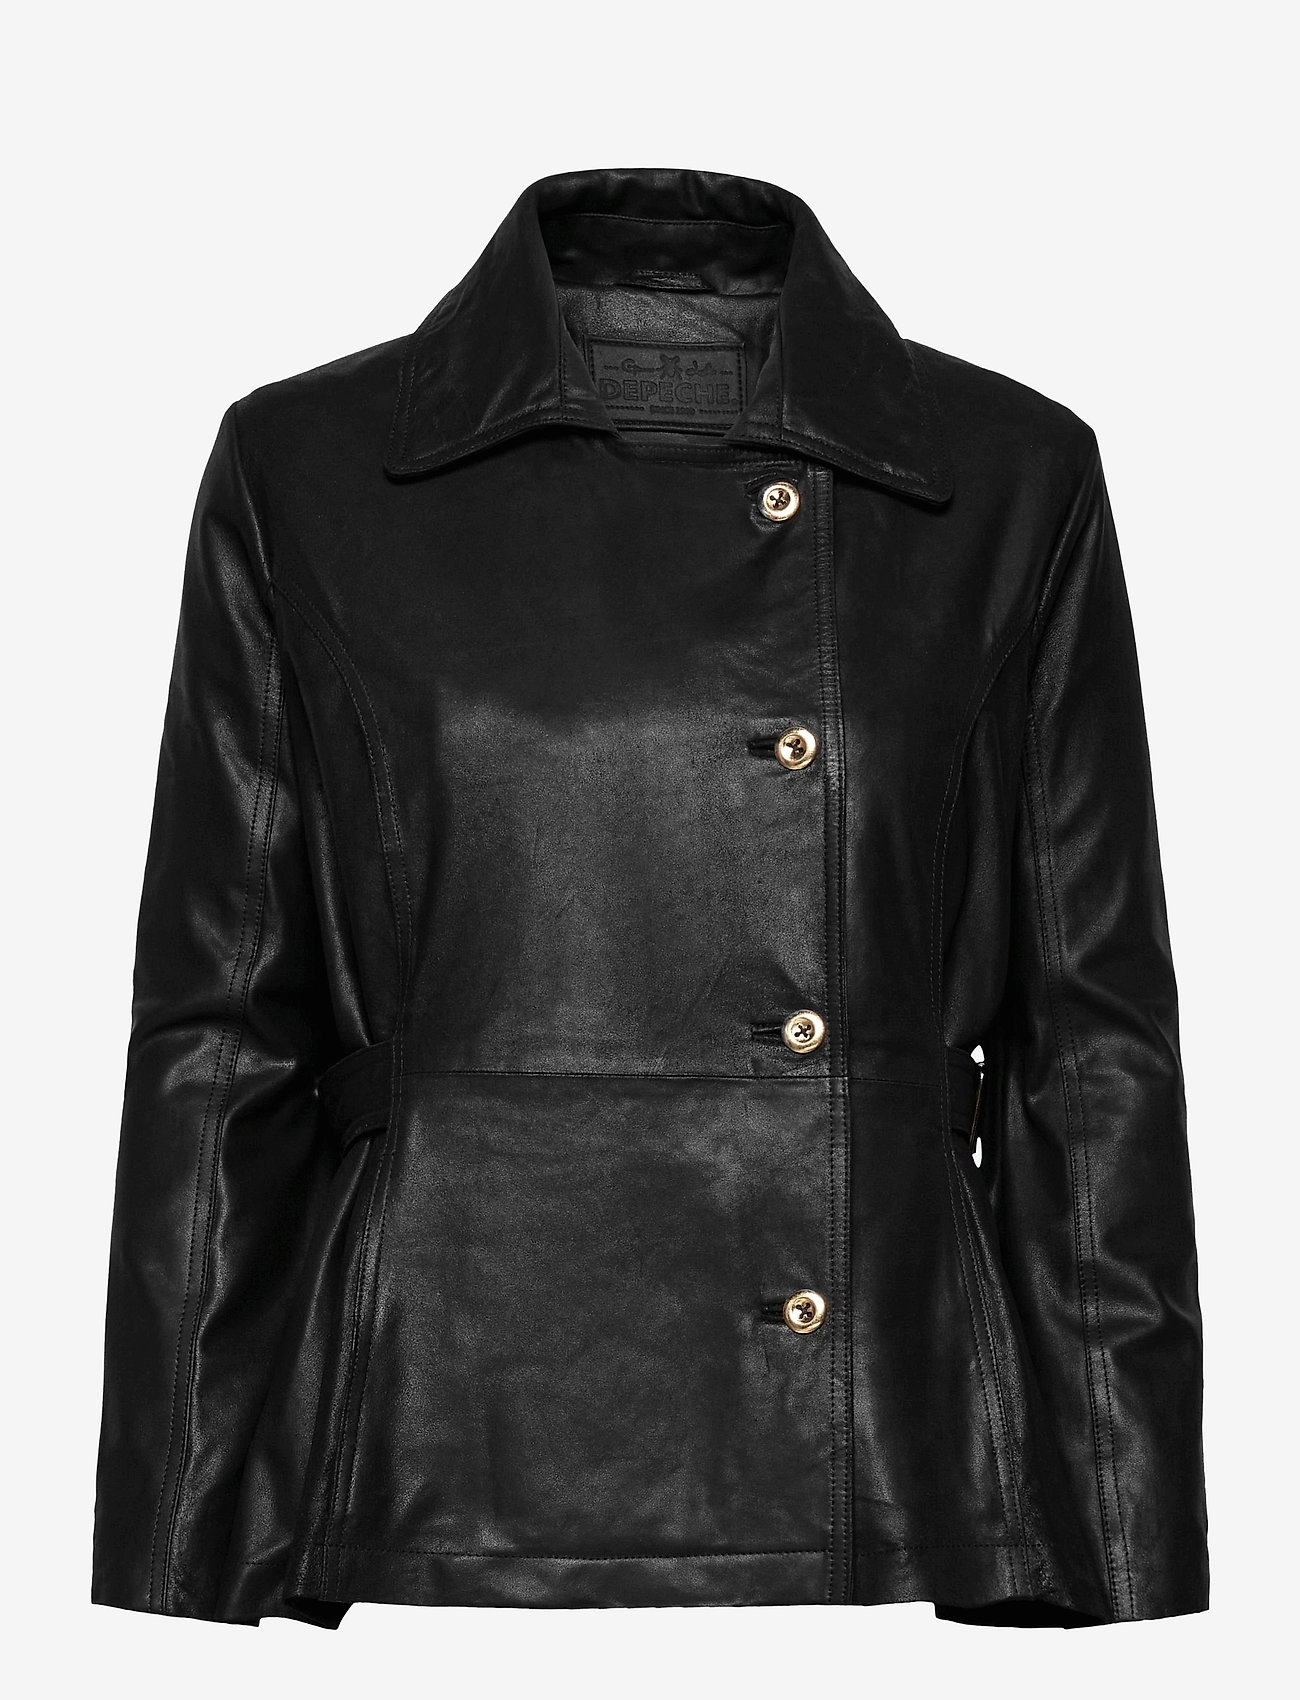 DEPECHE - Jacket - skinnjackor - black - 0